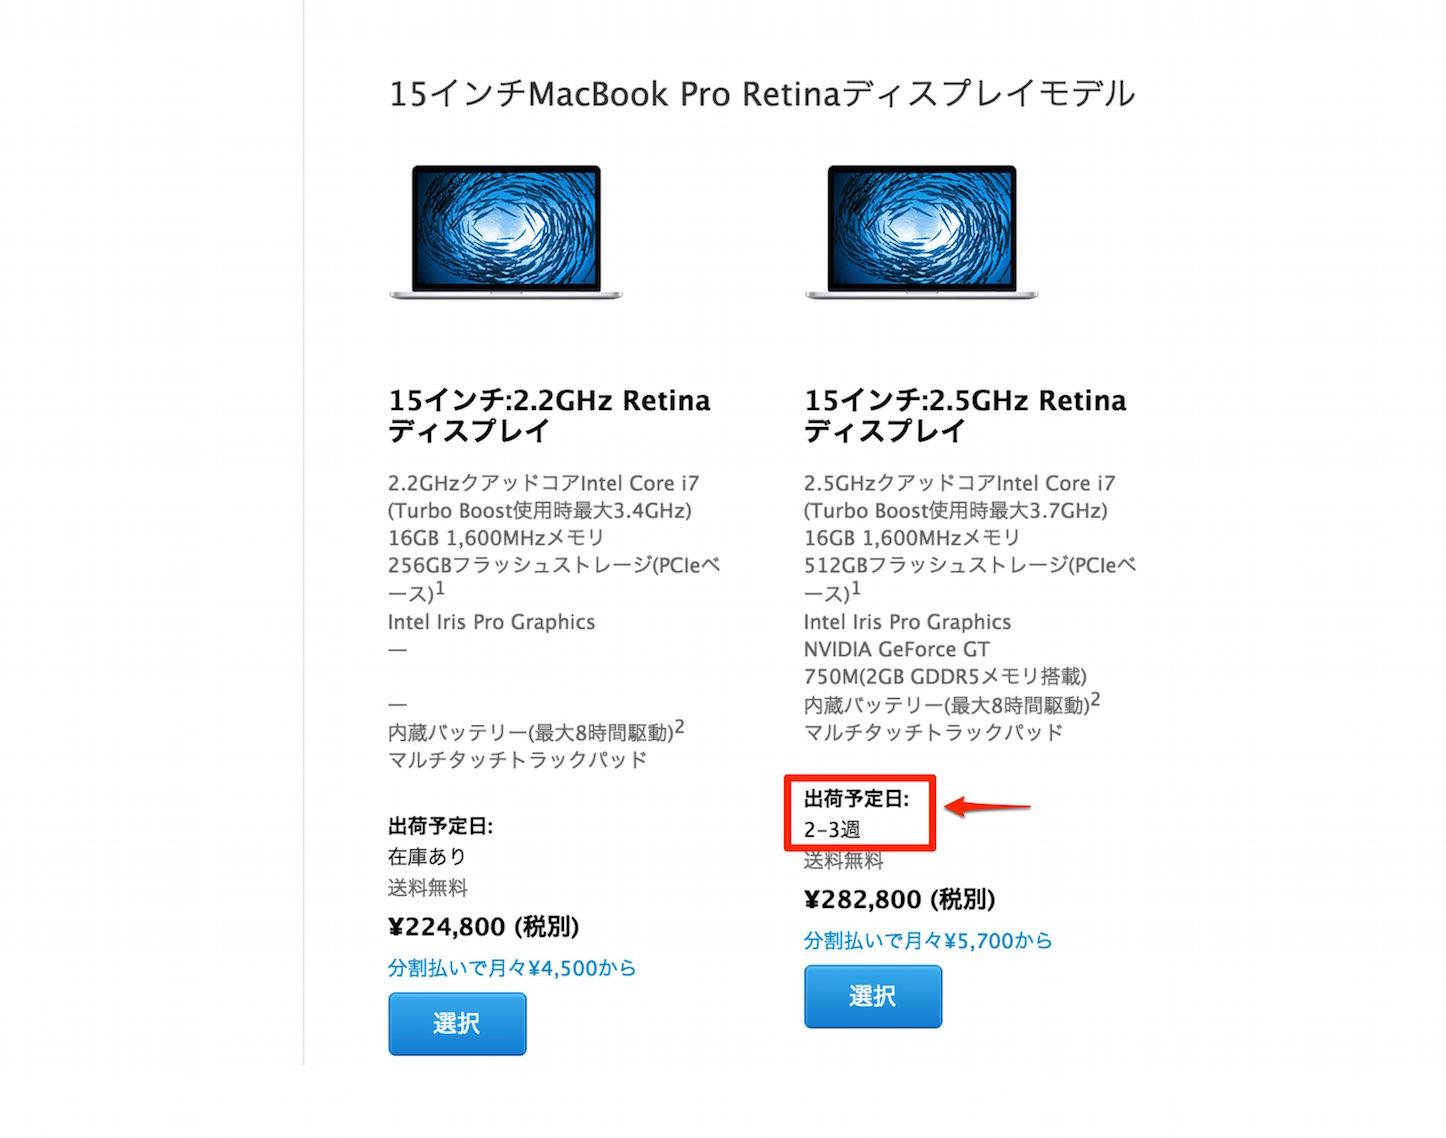 macbook-pro-retina-ship-date.jpg